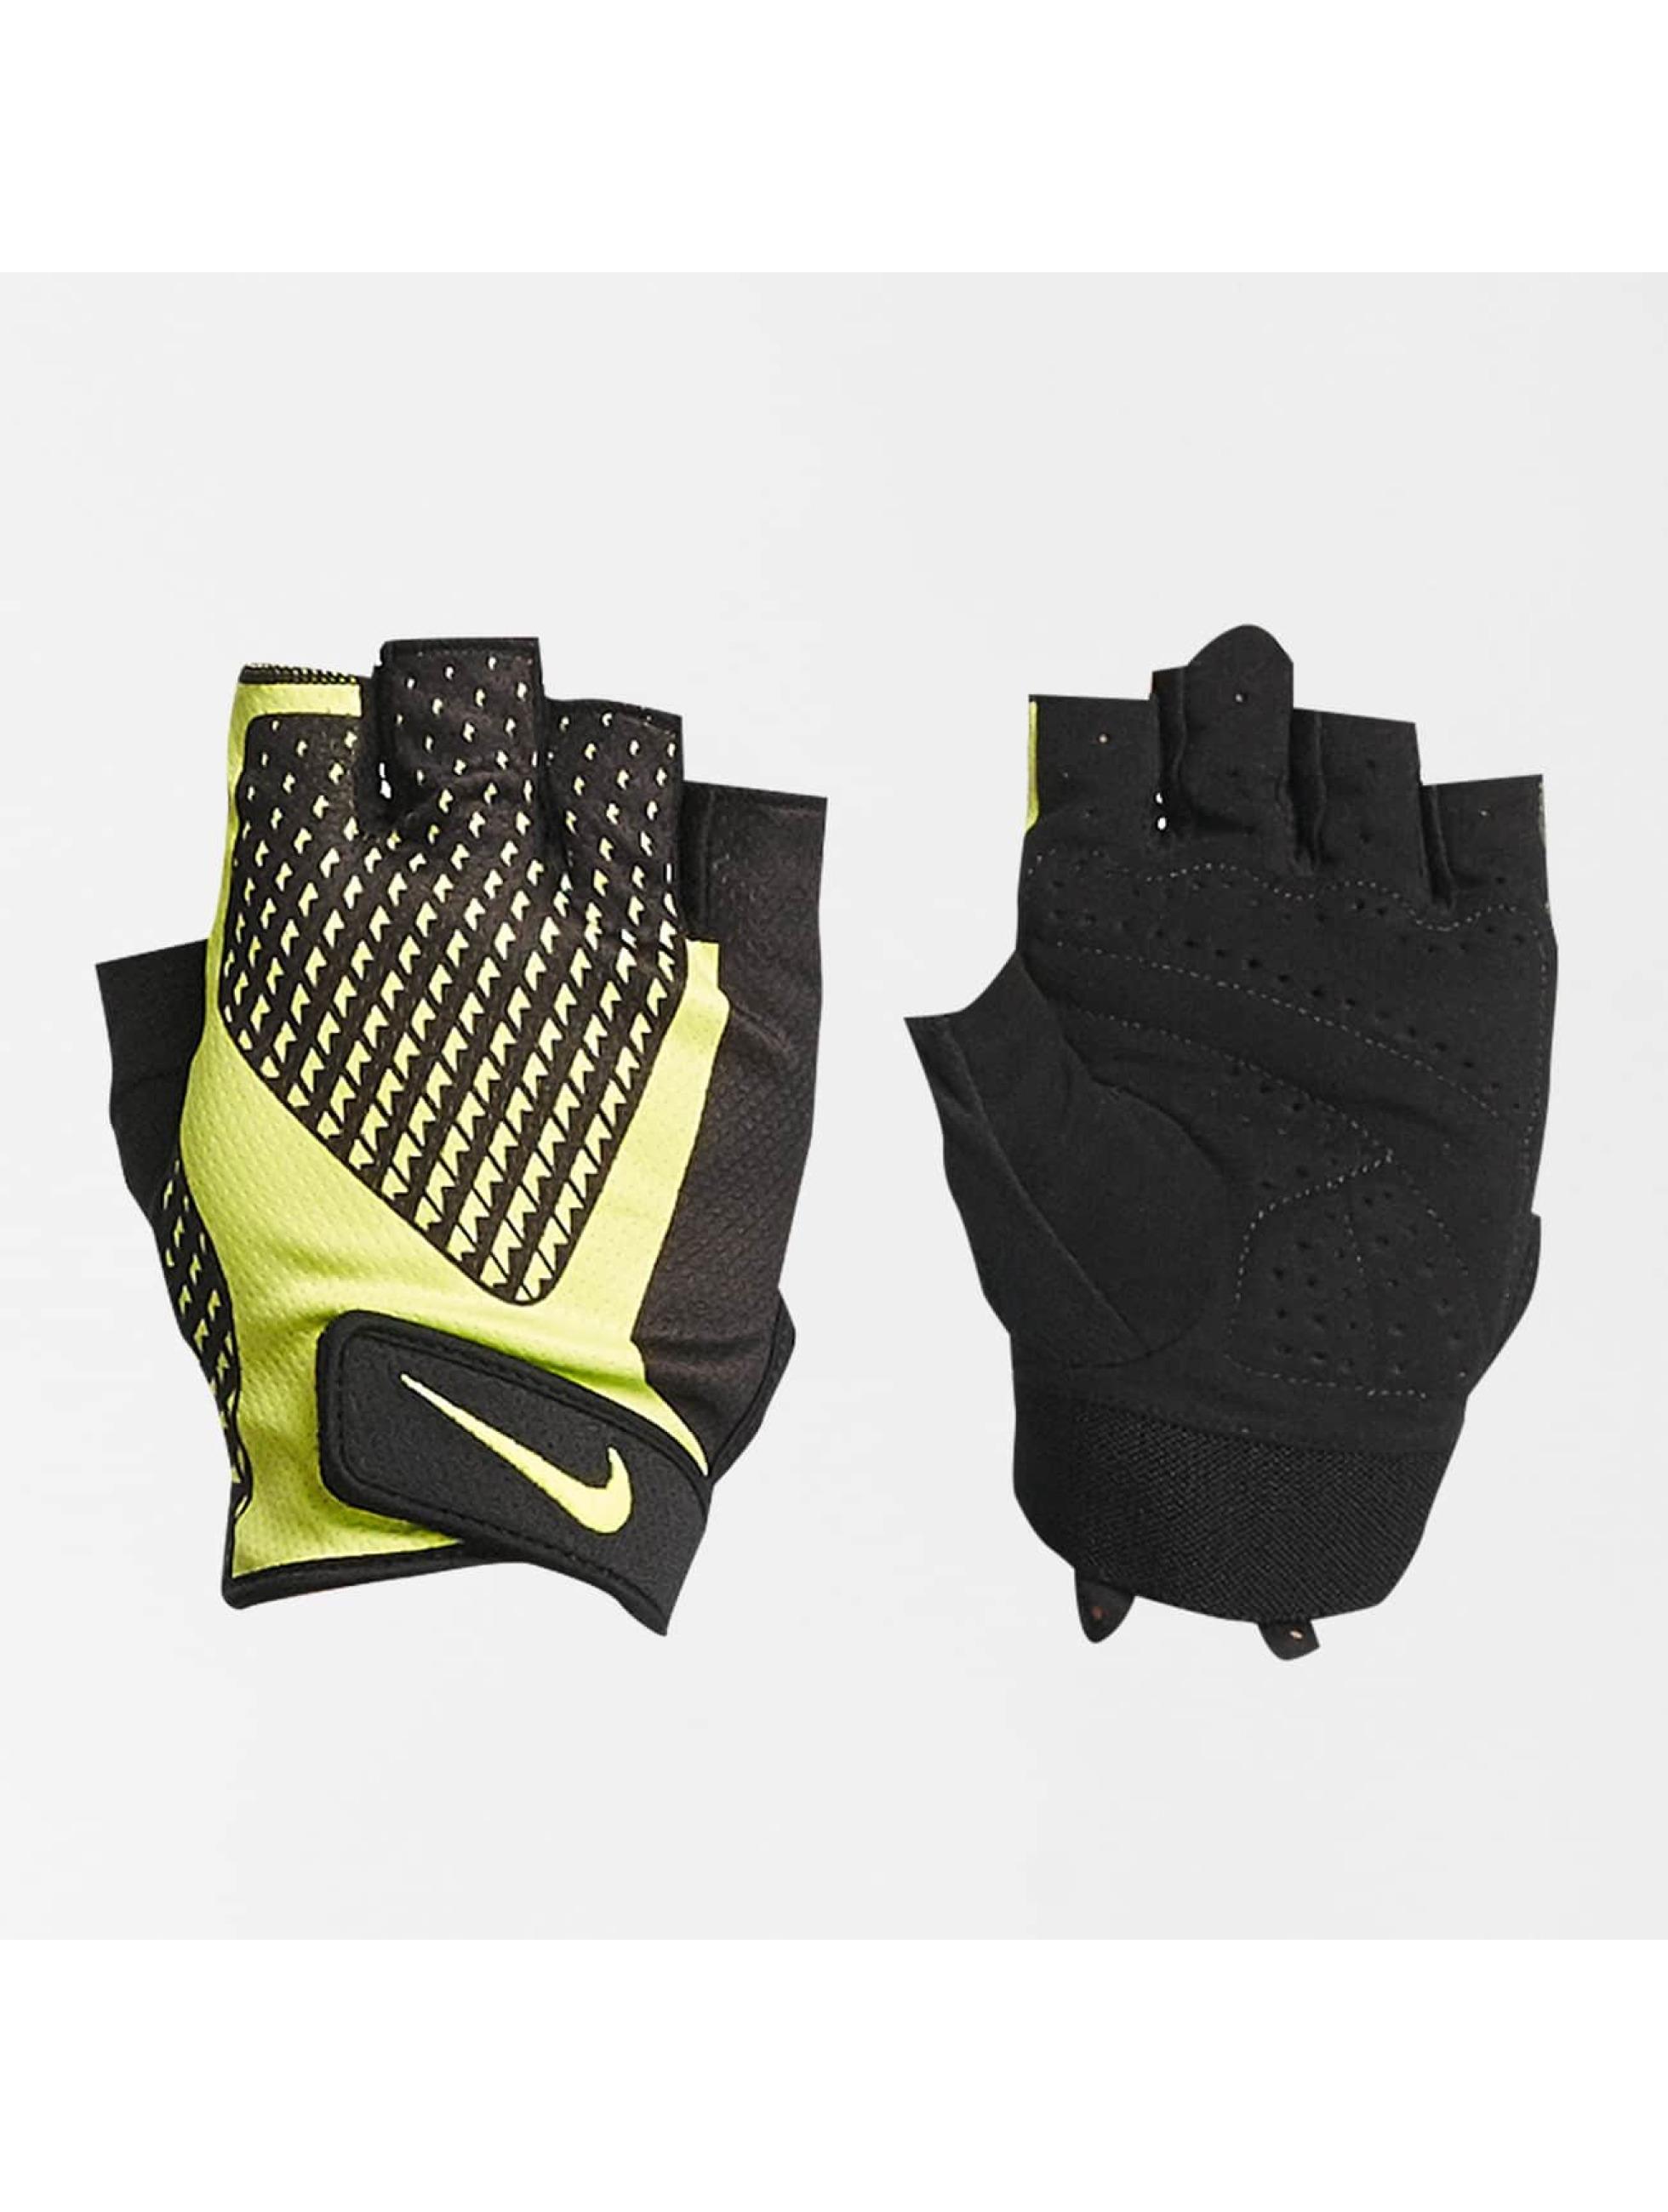 Nike Performance Männer Handschuhe Lunatic Training in schwarz